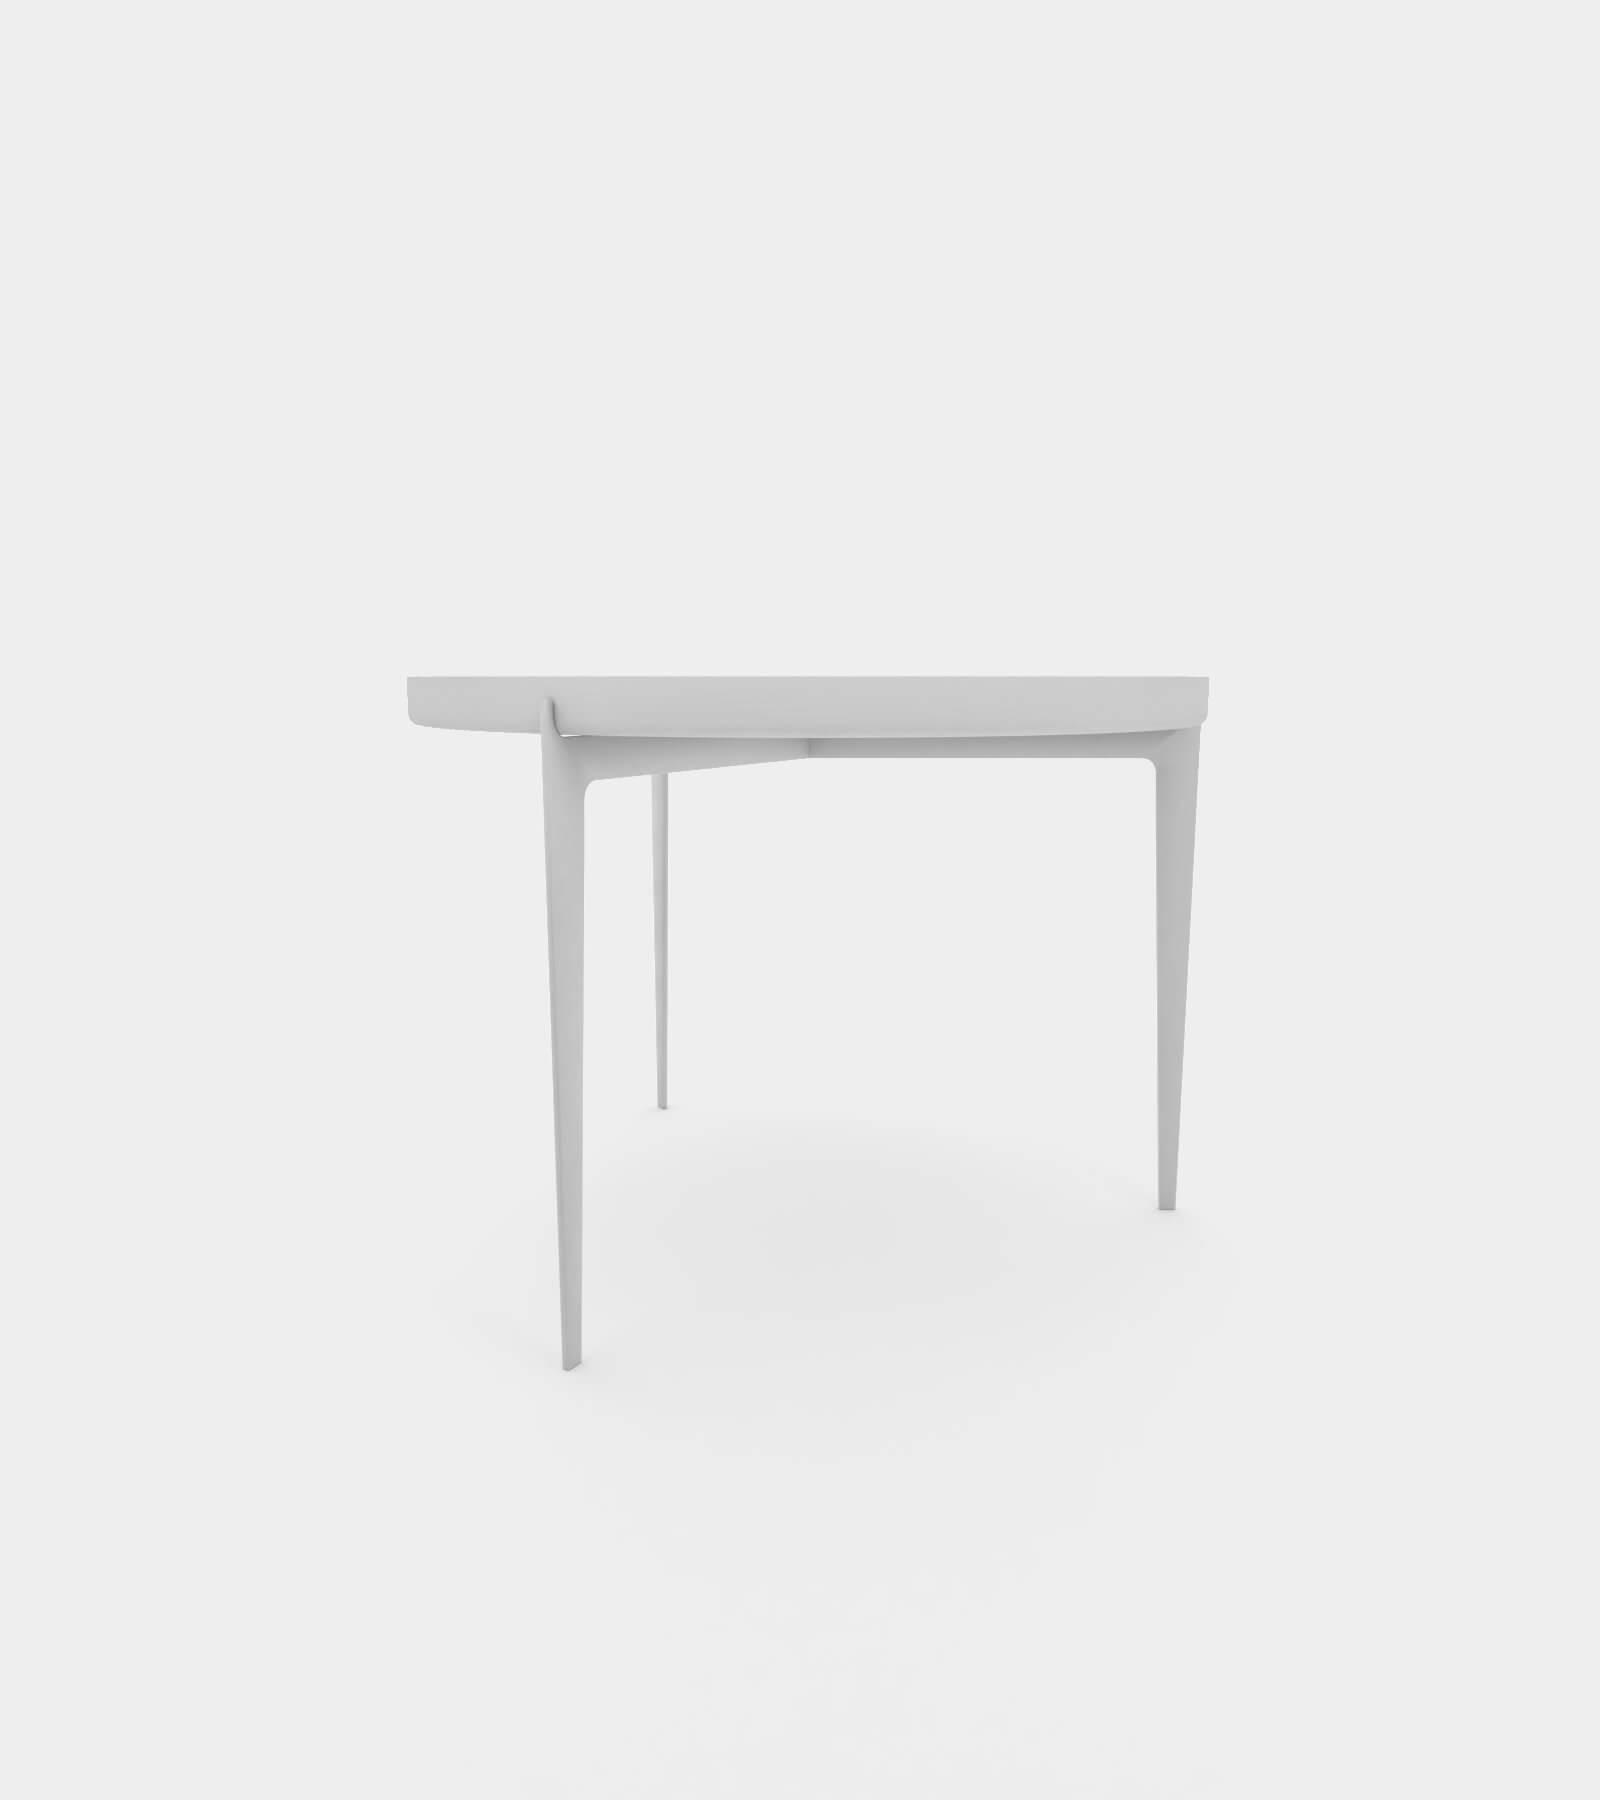 Modern metal coffee table 2 - 3D Model